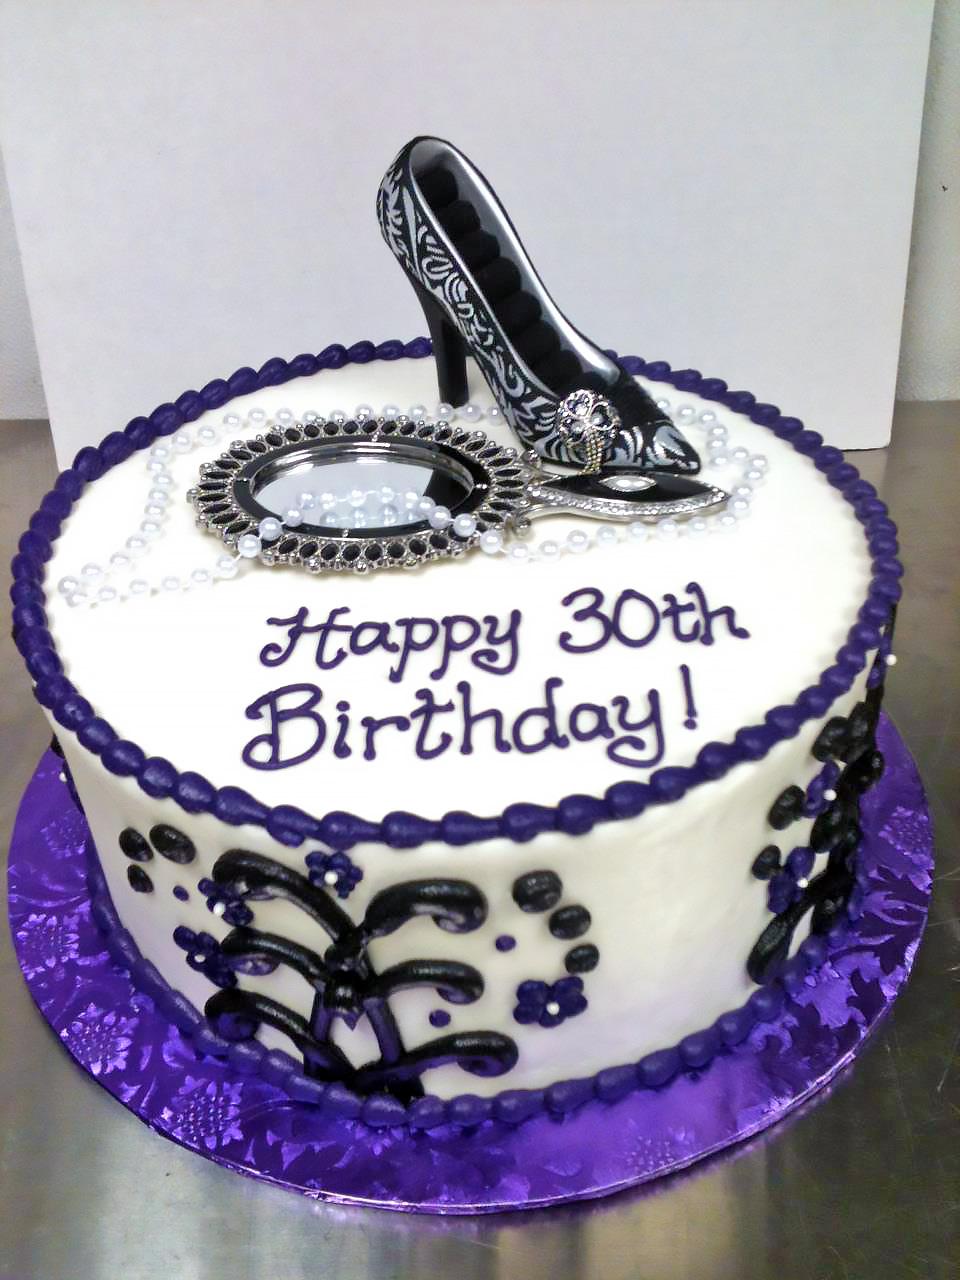 Birthday Cakes For Women Hands On Design Cakes